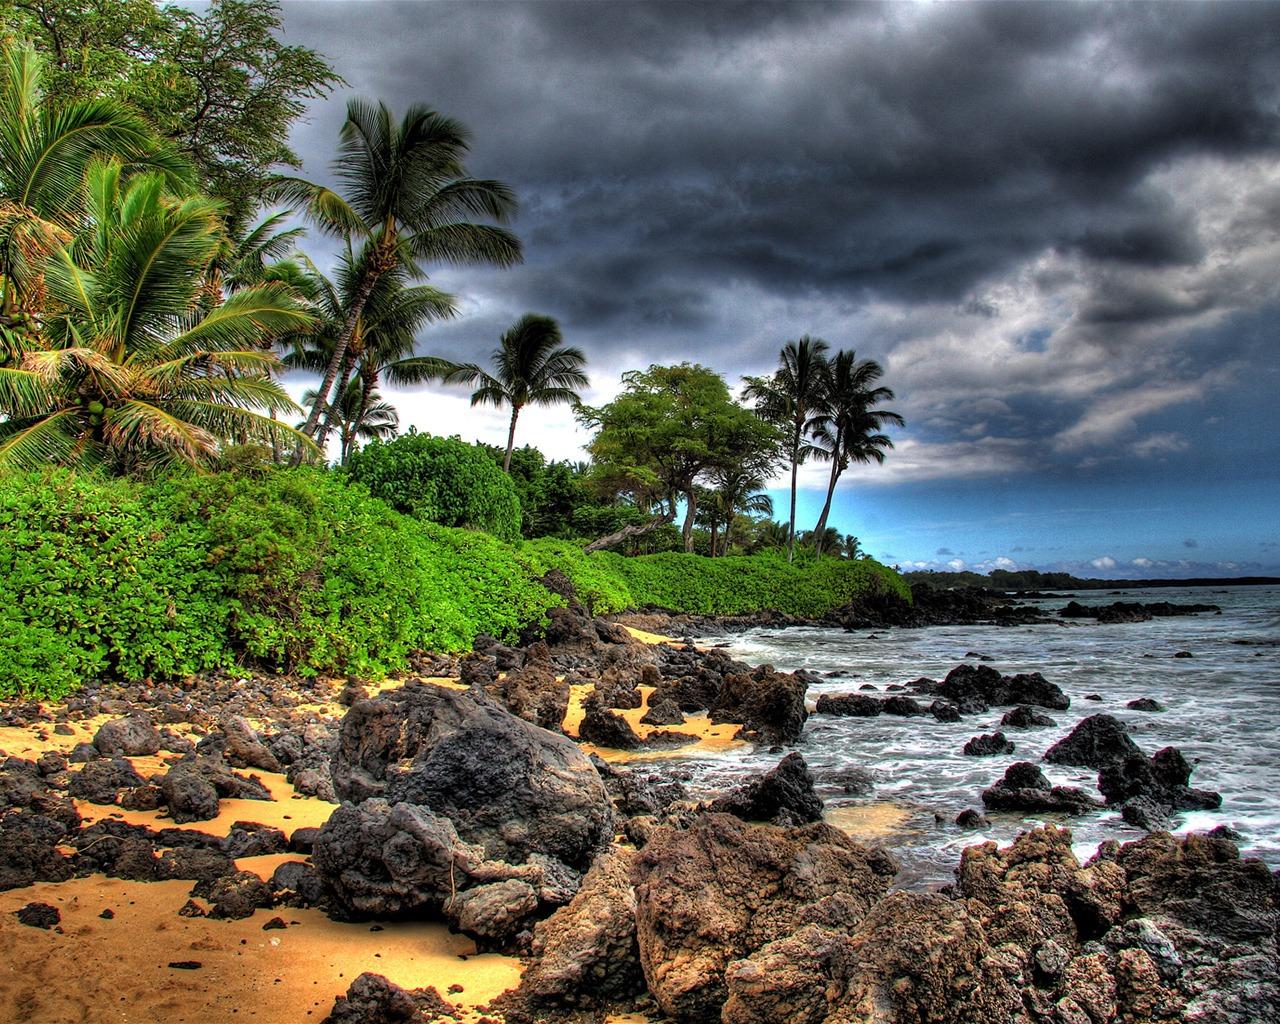 Maui Wallpaper Hawaii World Wallpapers In Jpg Format For